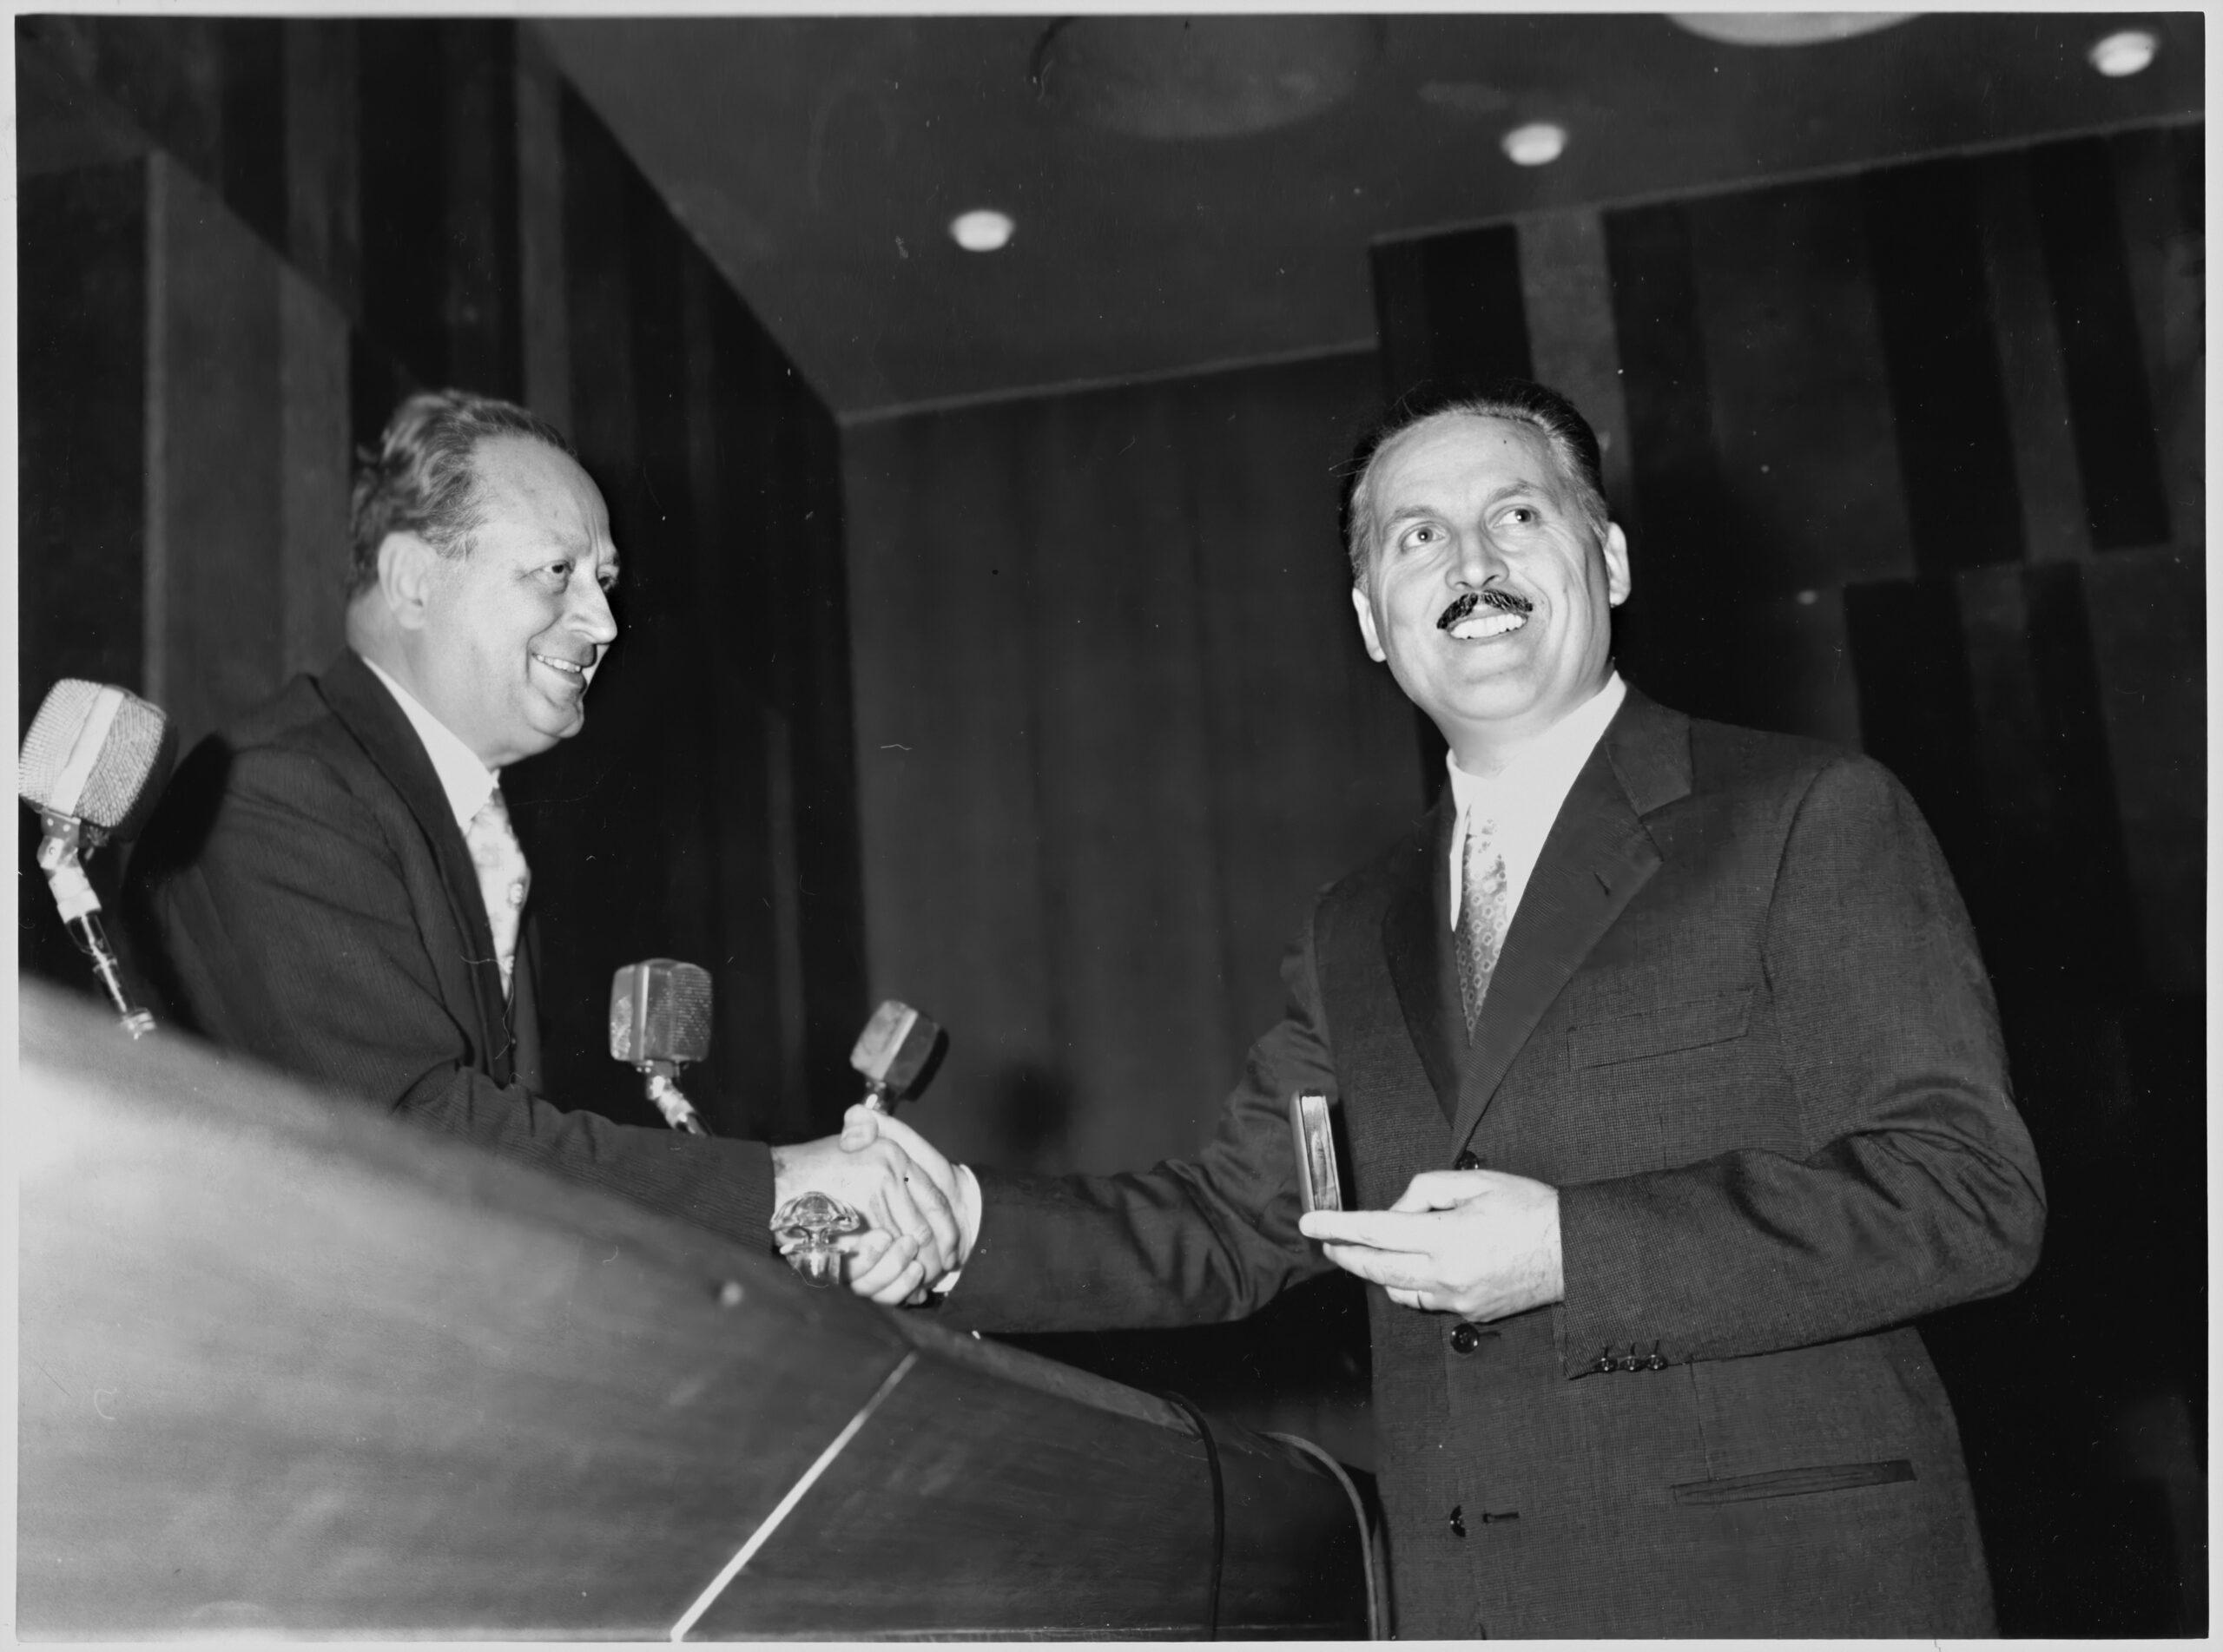 Franco Grignani and Dino Villani, Palma d'Oro to Necchi, Chamber of Commerce in Milan, 21 Oct. 1959